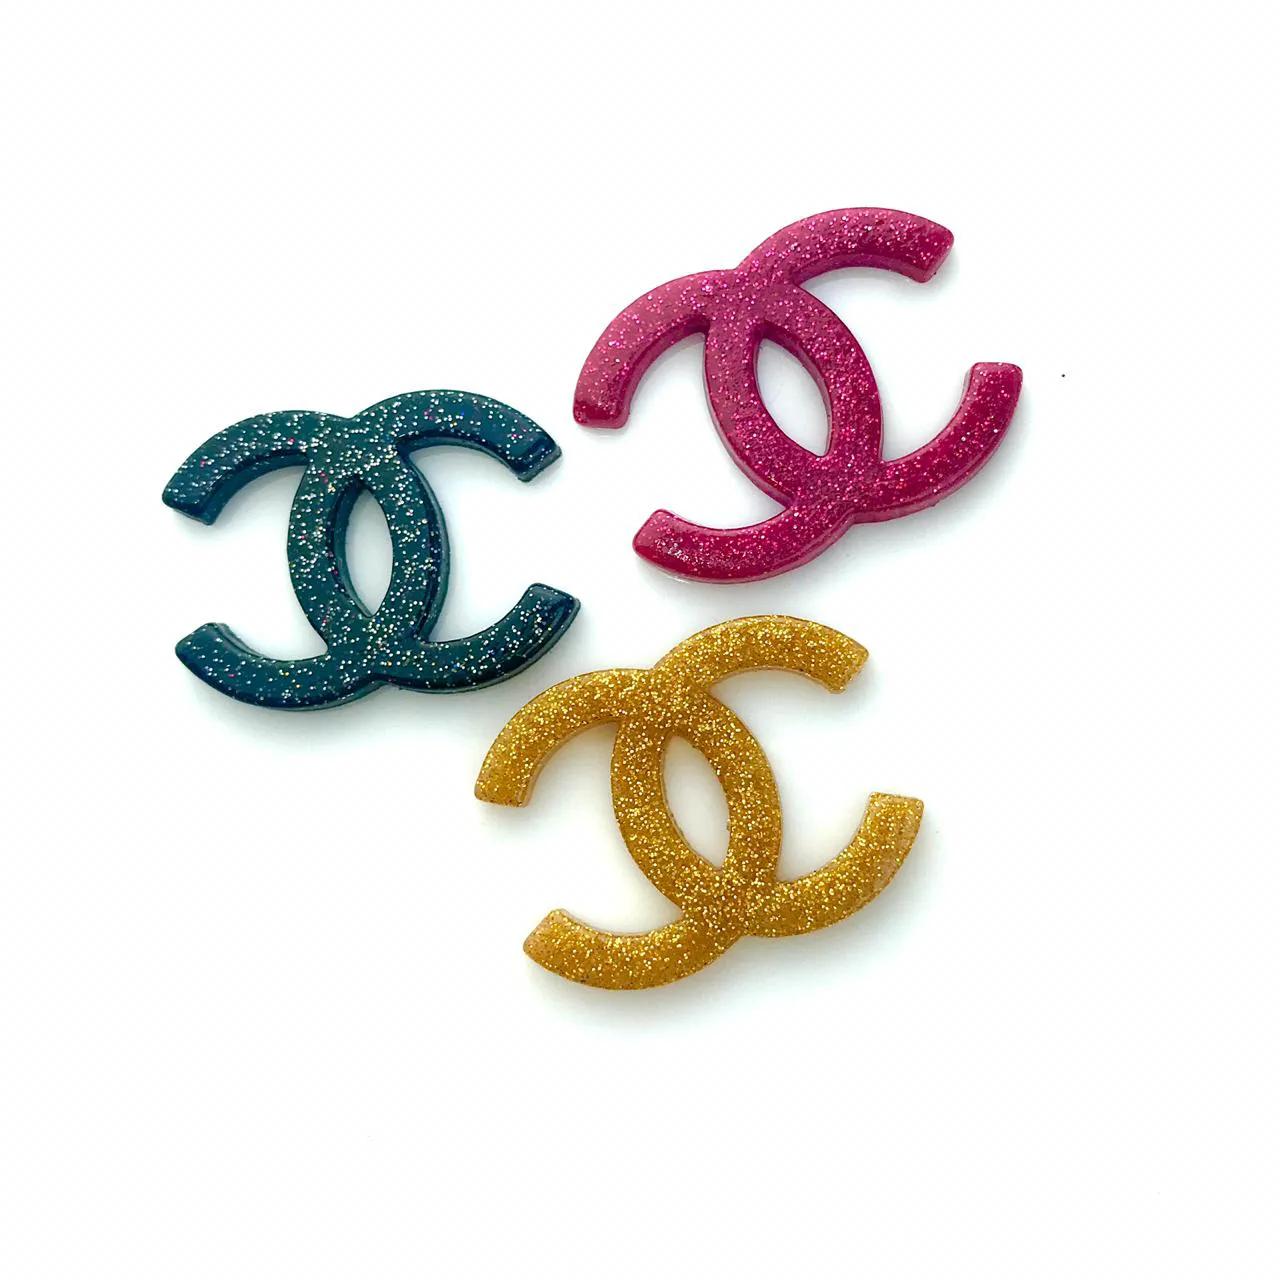 Aplique Emborrachado Chanel Glitter